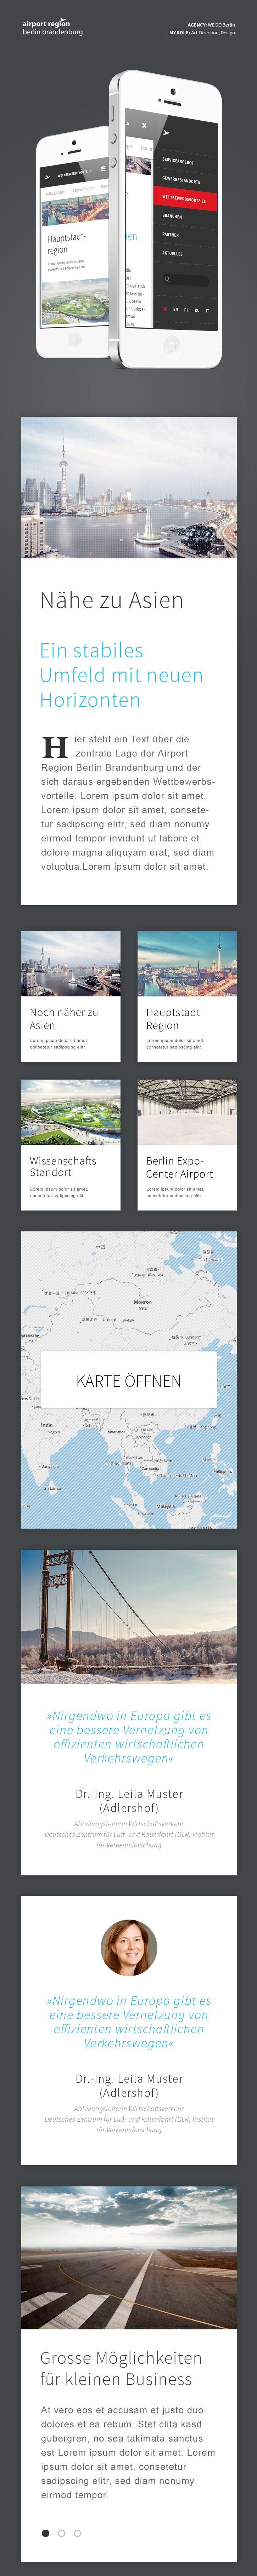 BER Airport Region Mobile - George Kvasnikov - Designer